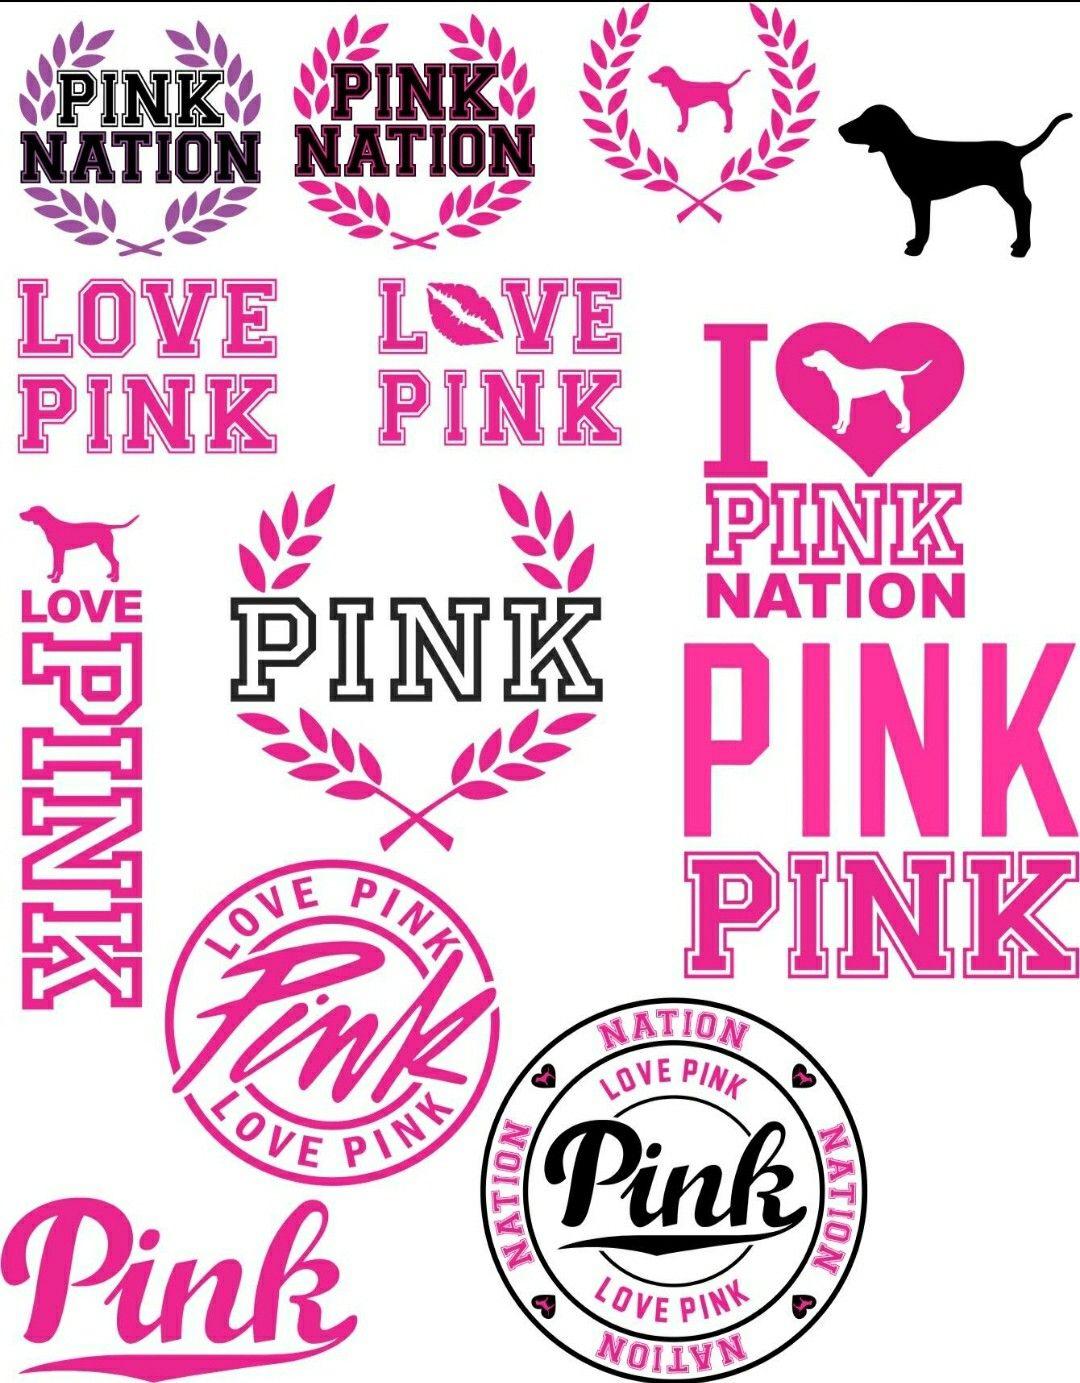 Pink vs in 2020 Pink logo, Vs pink logo, Cricut monogram